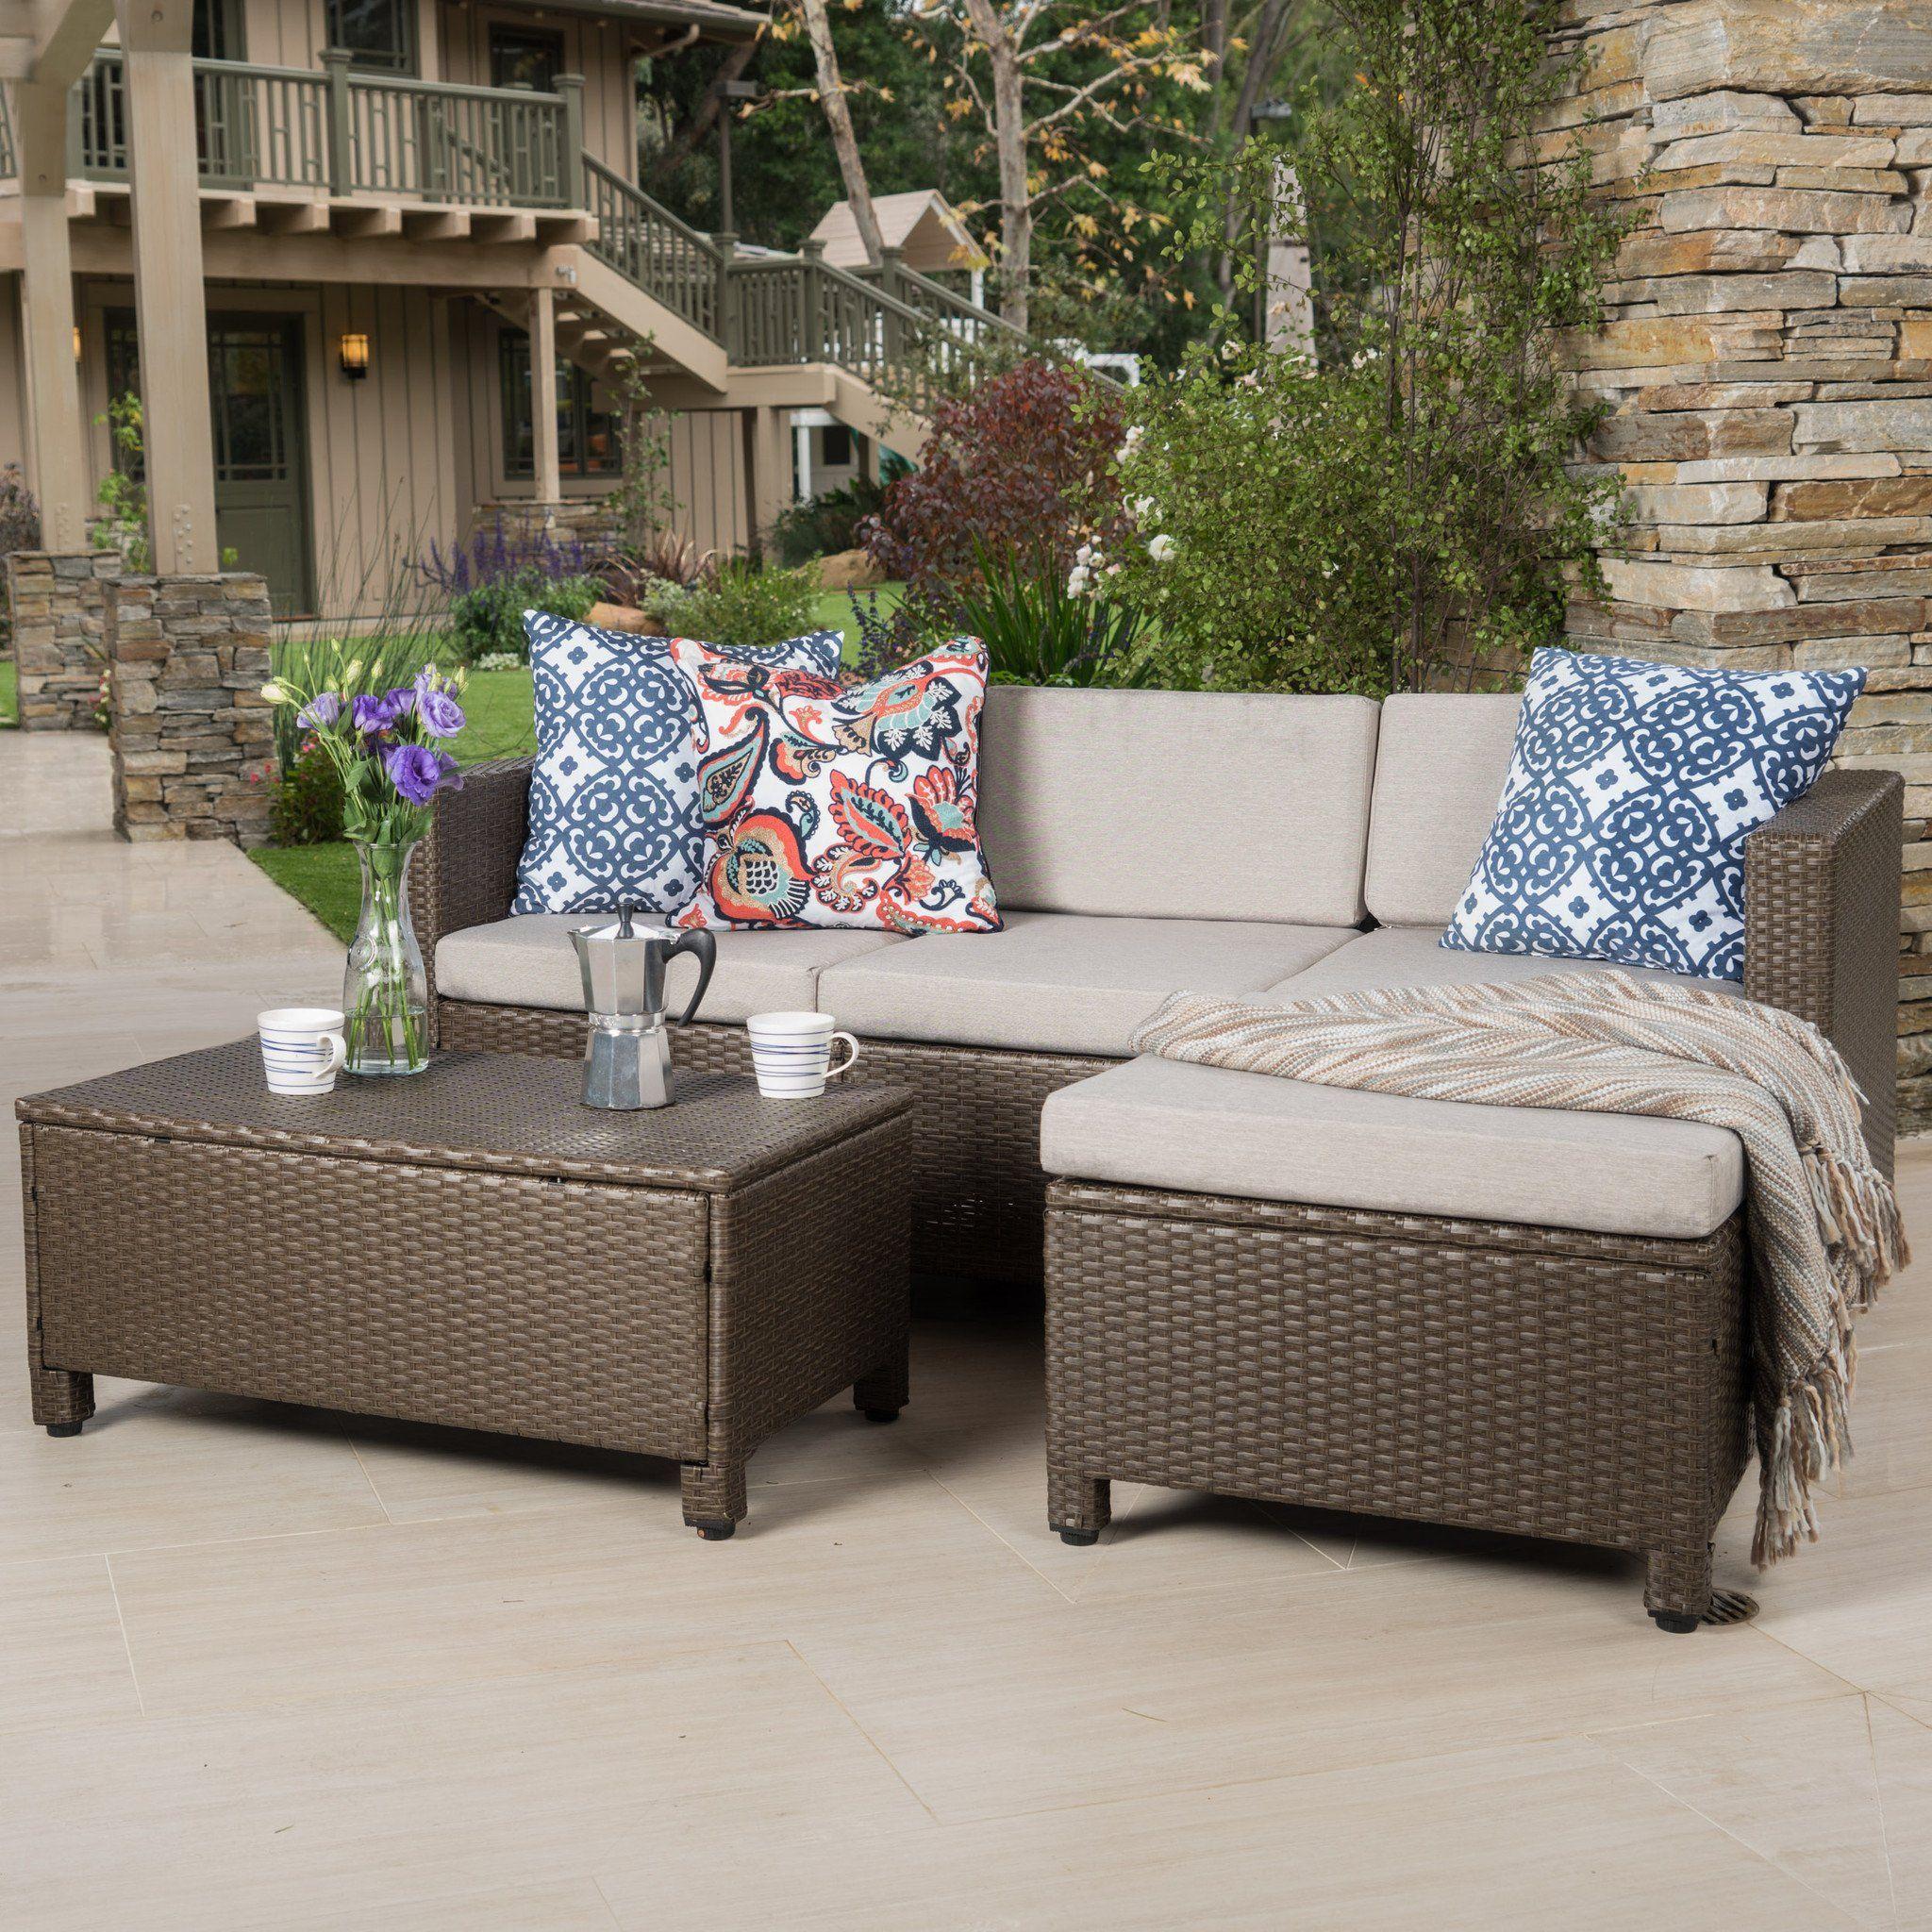 Budva Outdoor L Shape Brown Wicker Sofa W Cushions Porch Furniture Pallet Furniture Outdoor Furniture